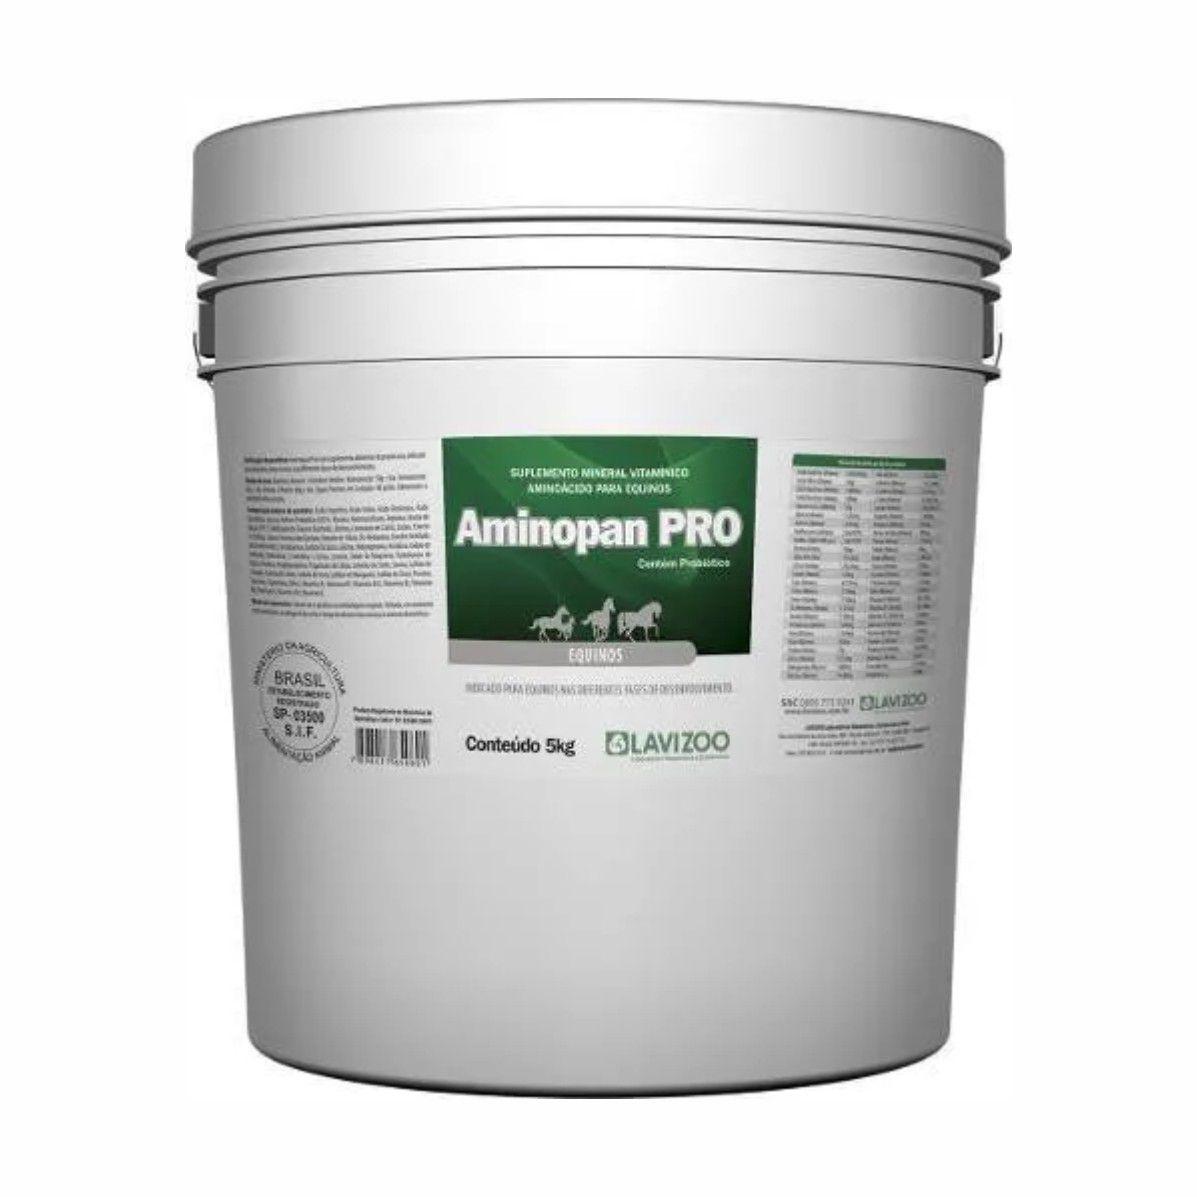 Aminopan PRO (Com Probiótico) Suplemento Equinos, Suínos e Aves - Lavizoo